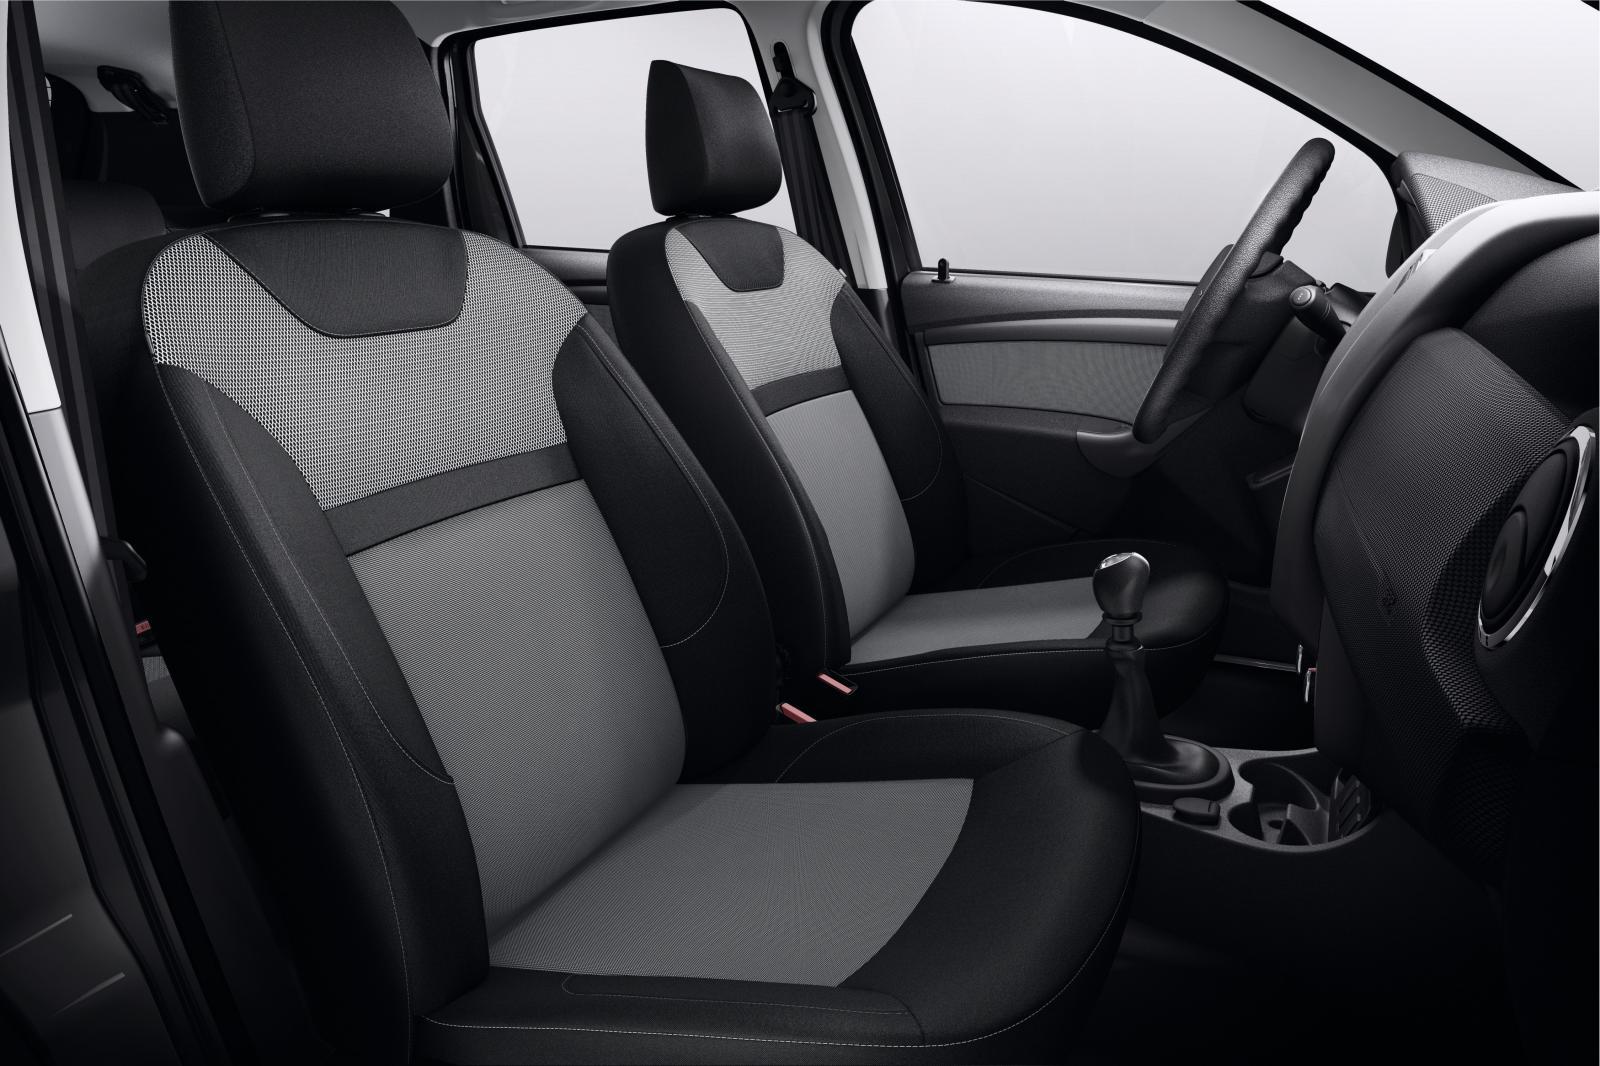 Dacia Duster Edition 2016 Resim Galerisi